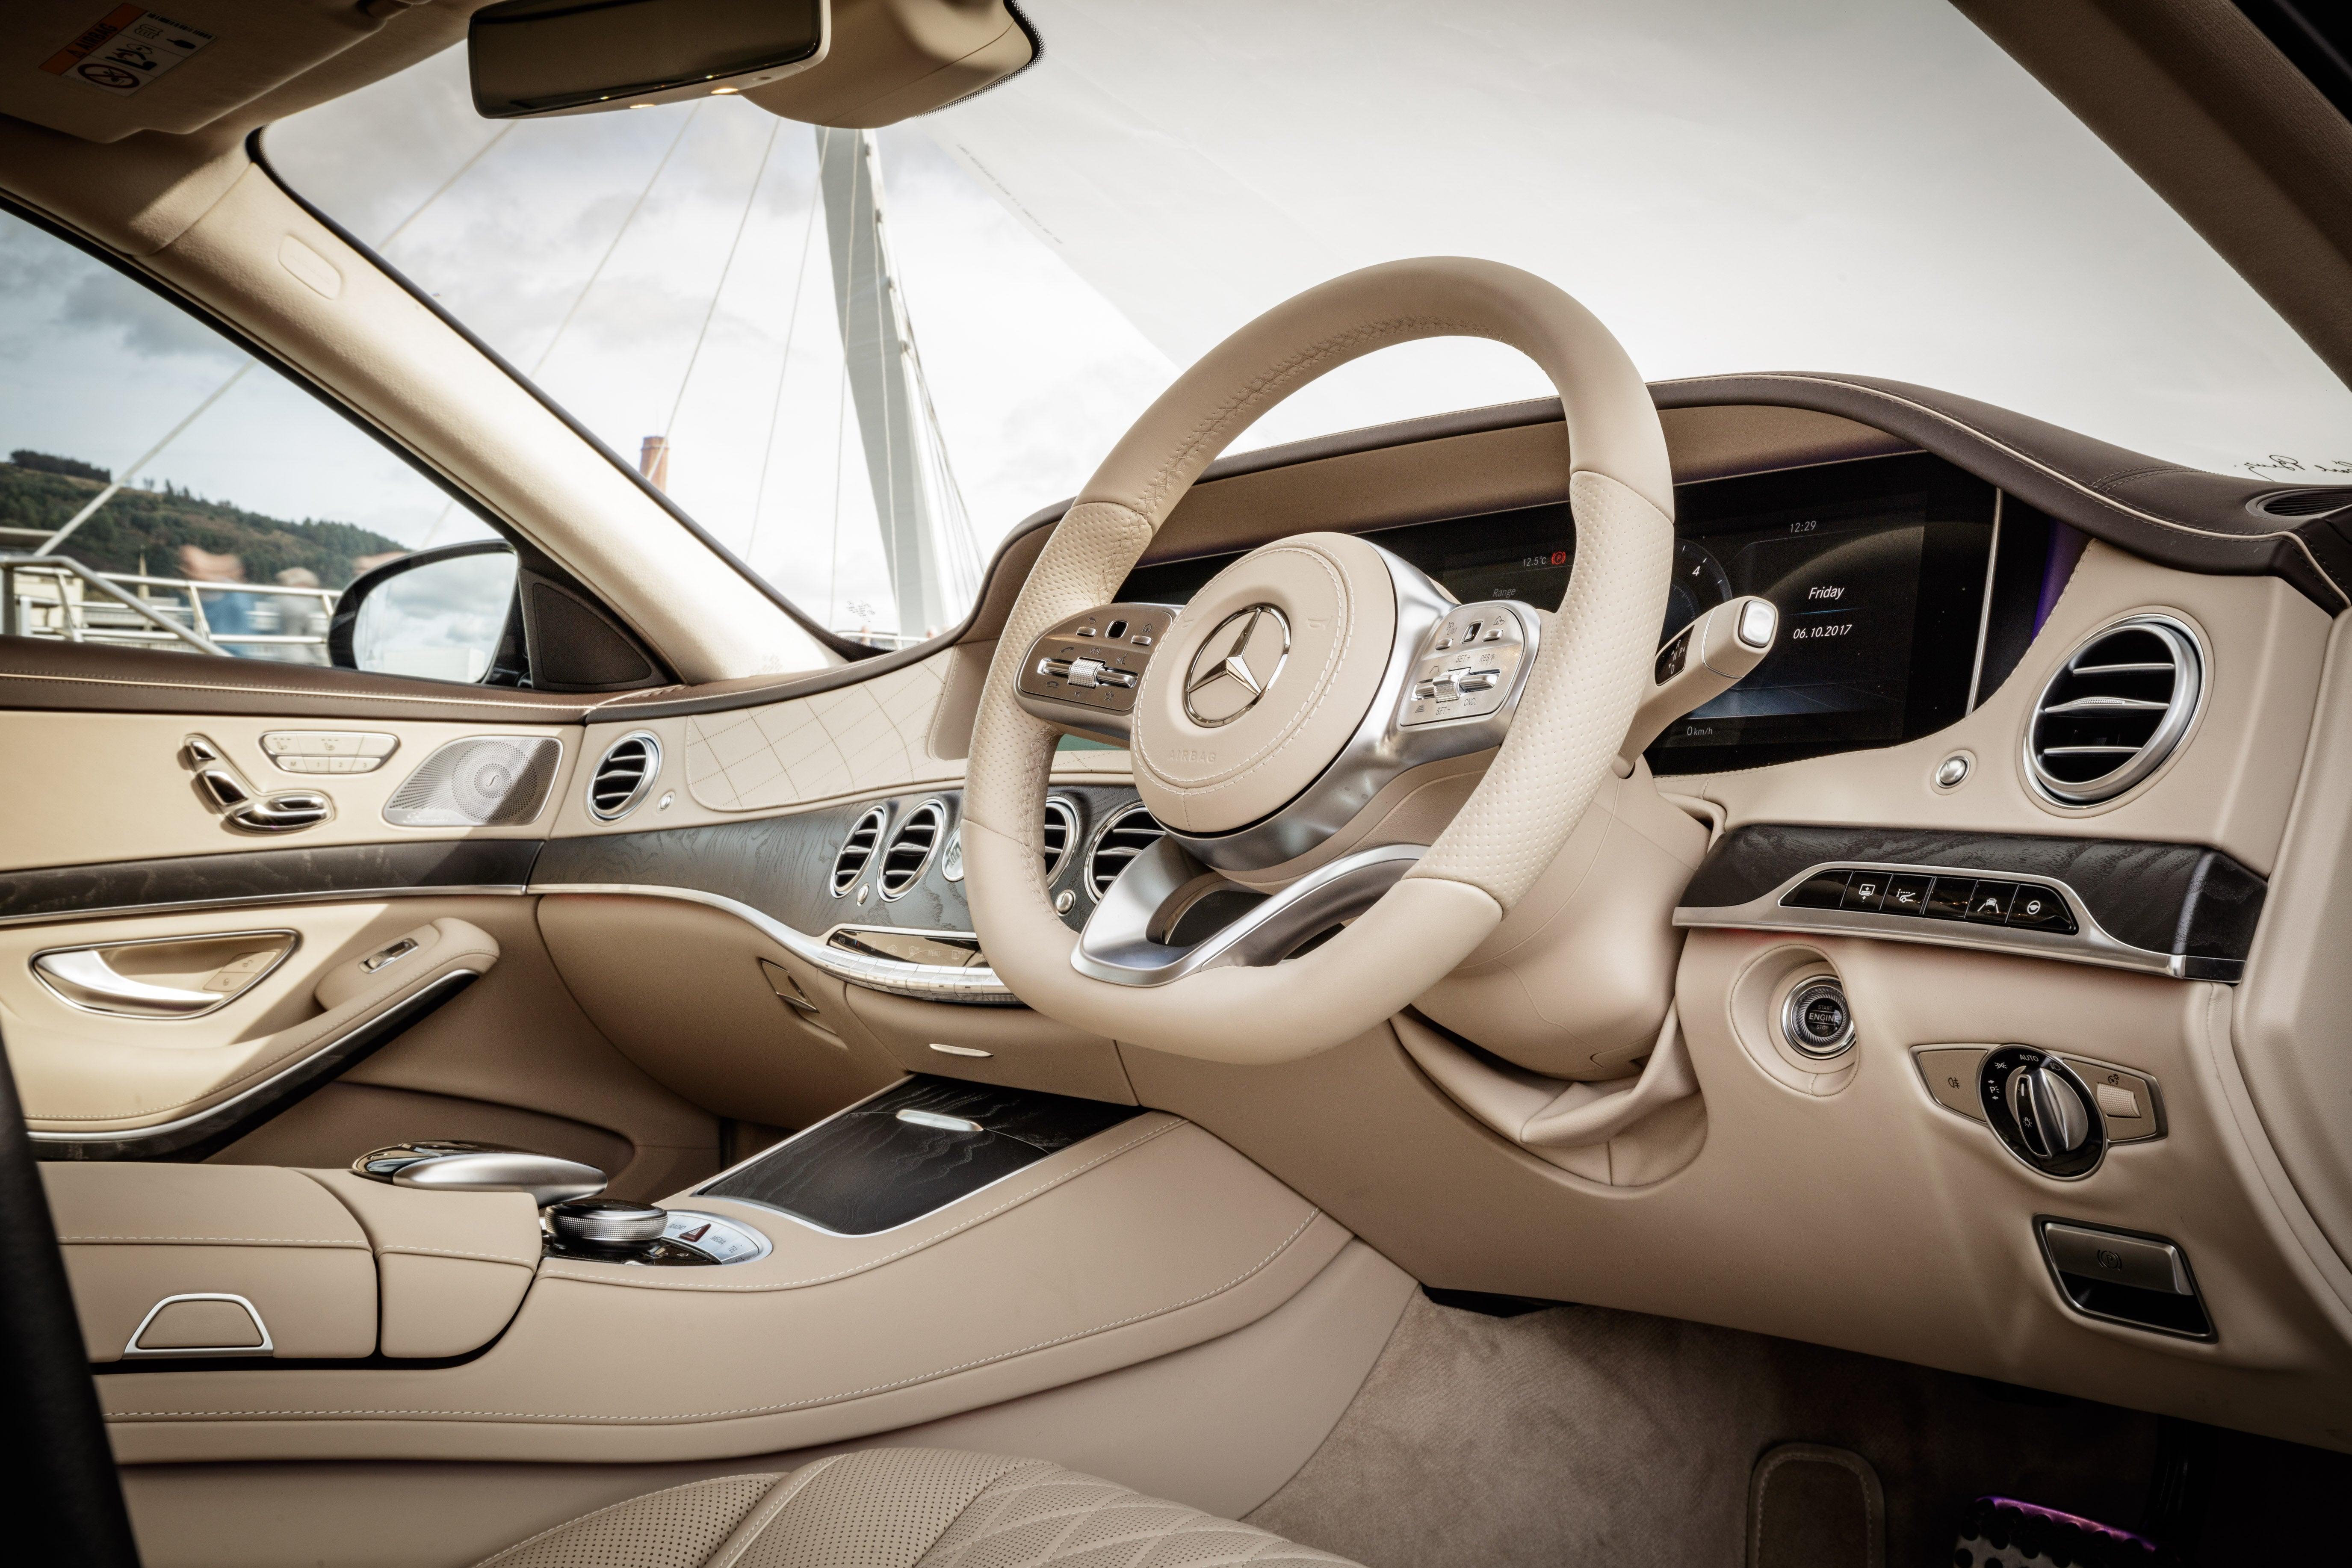 Mercedes S-Class front interior